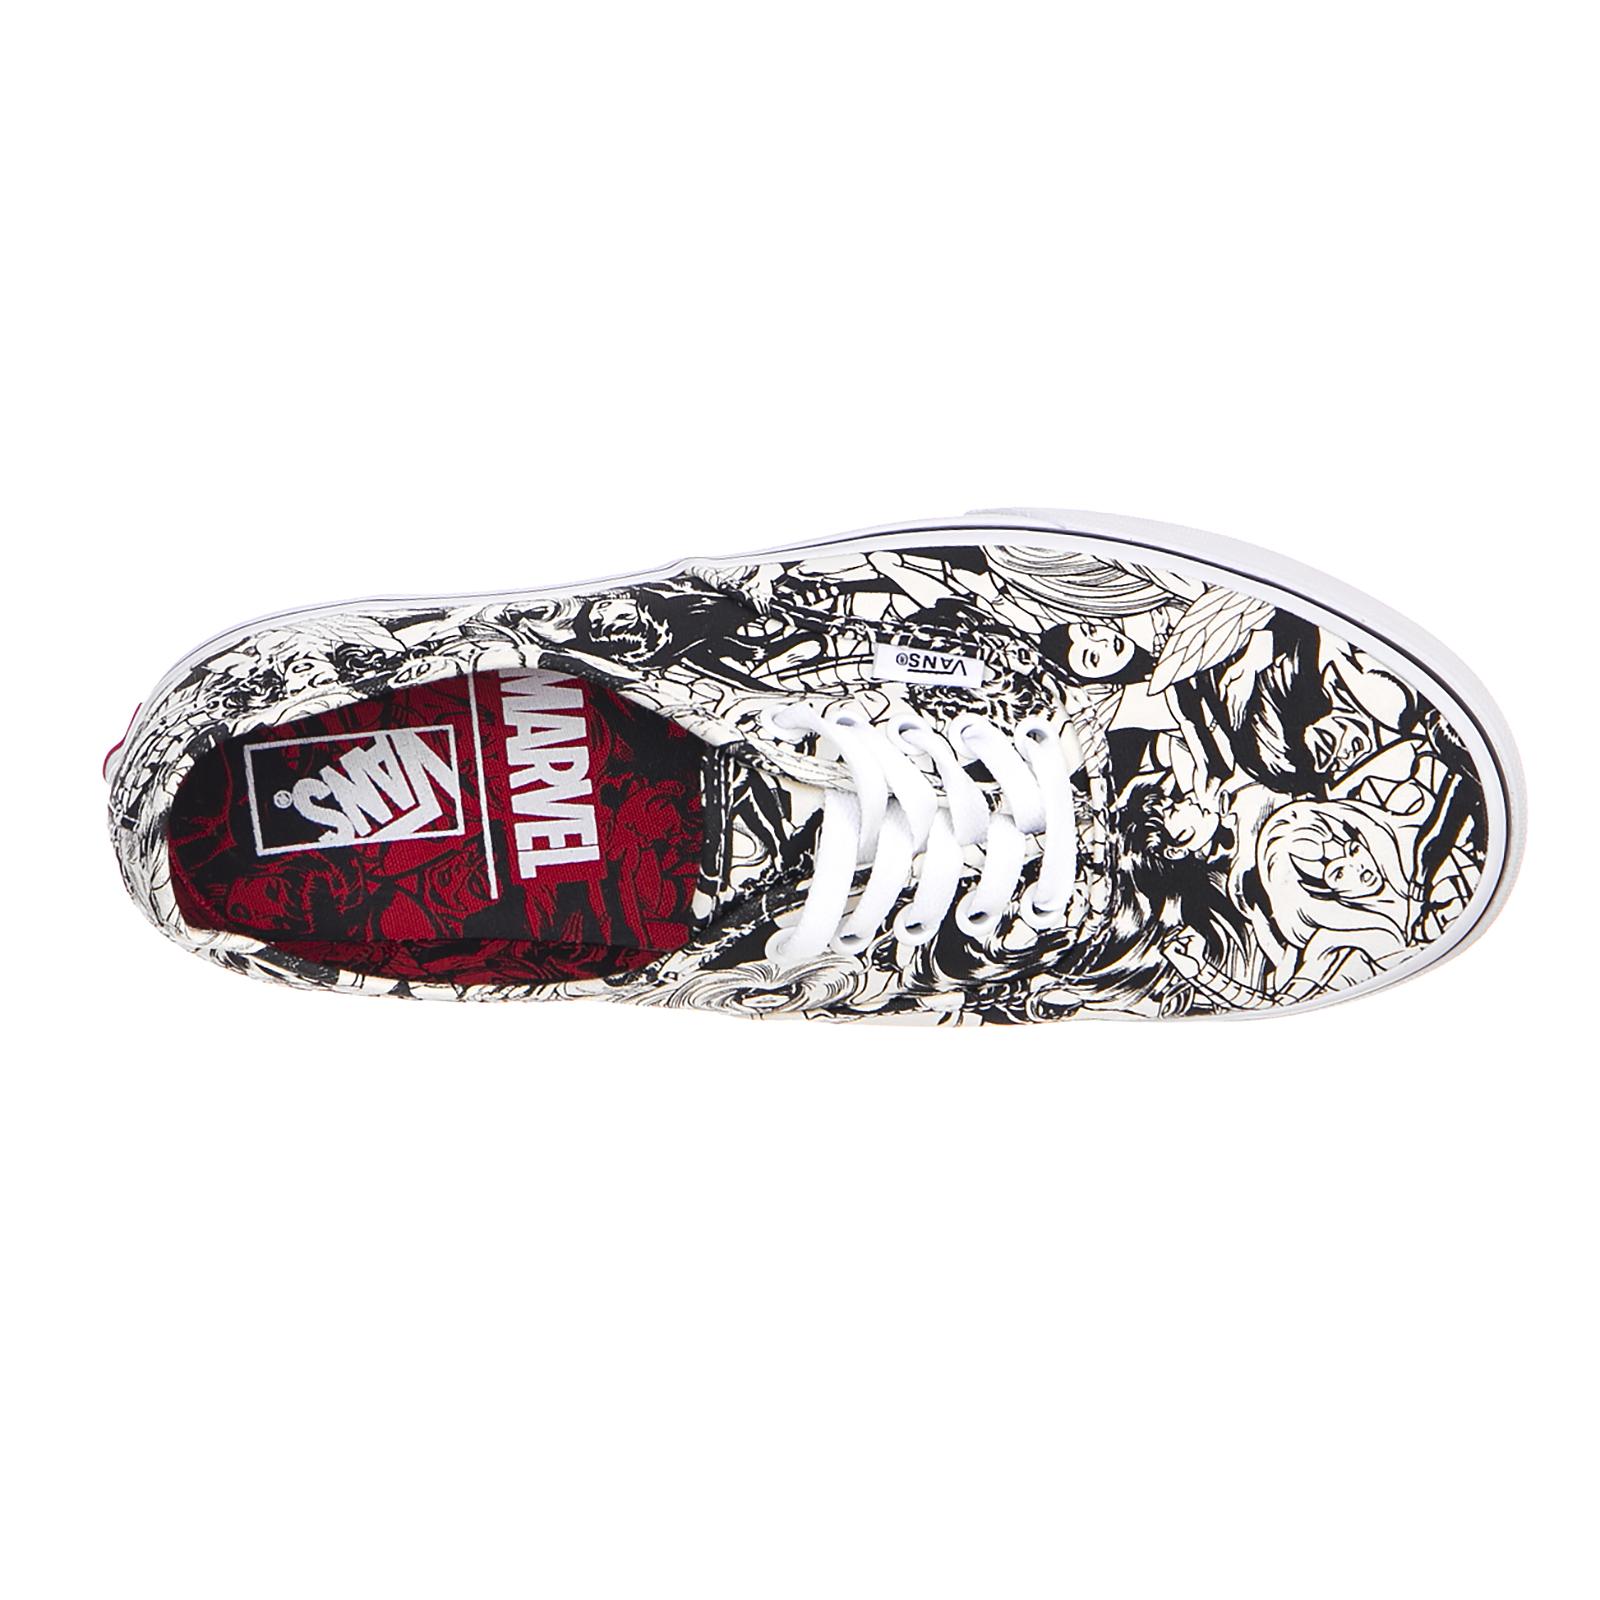 B0f026 Vans Ua Baratotravel AuthenticmarvelMul Bianco es Sneakers stQrdh